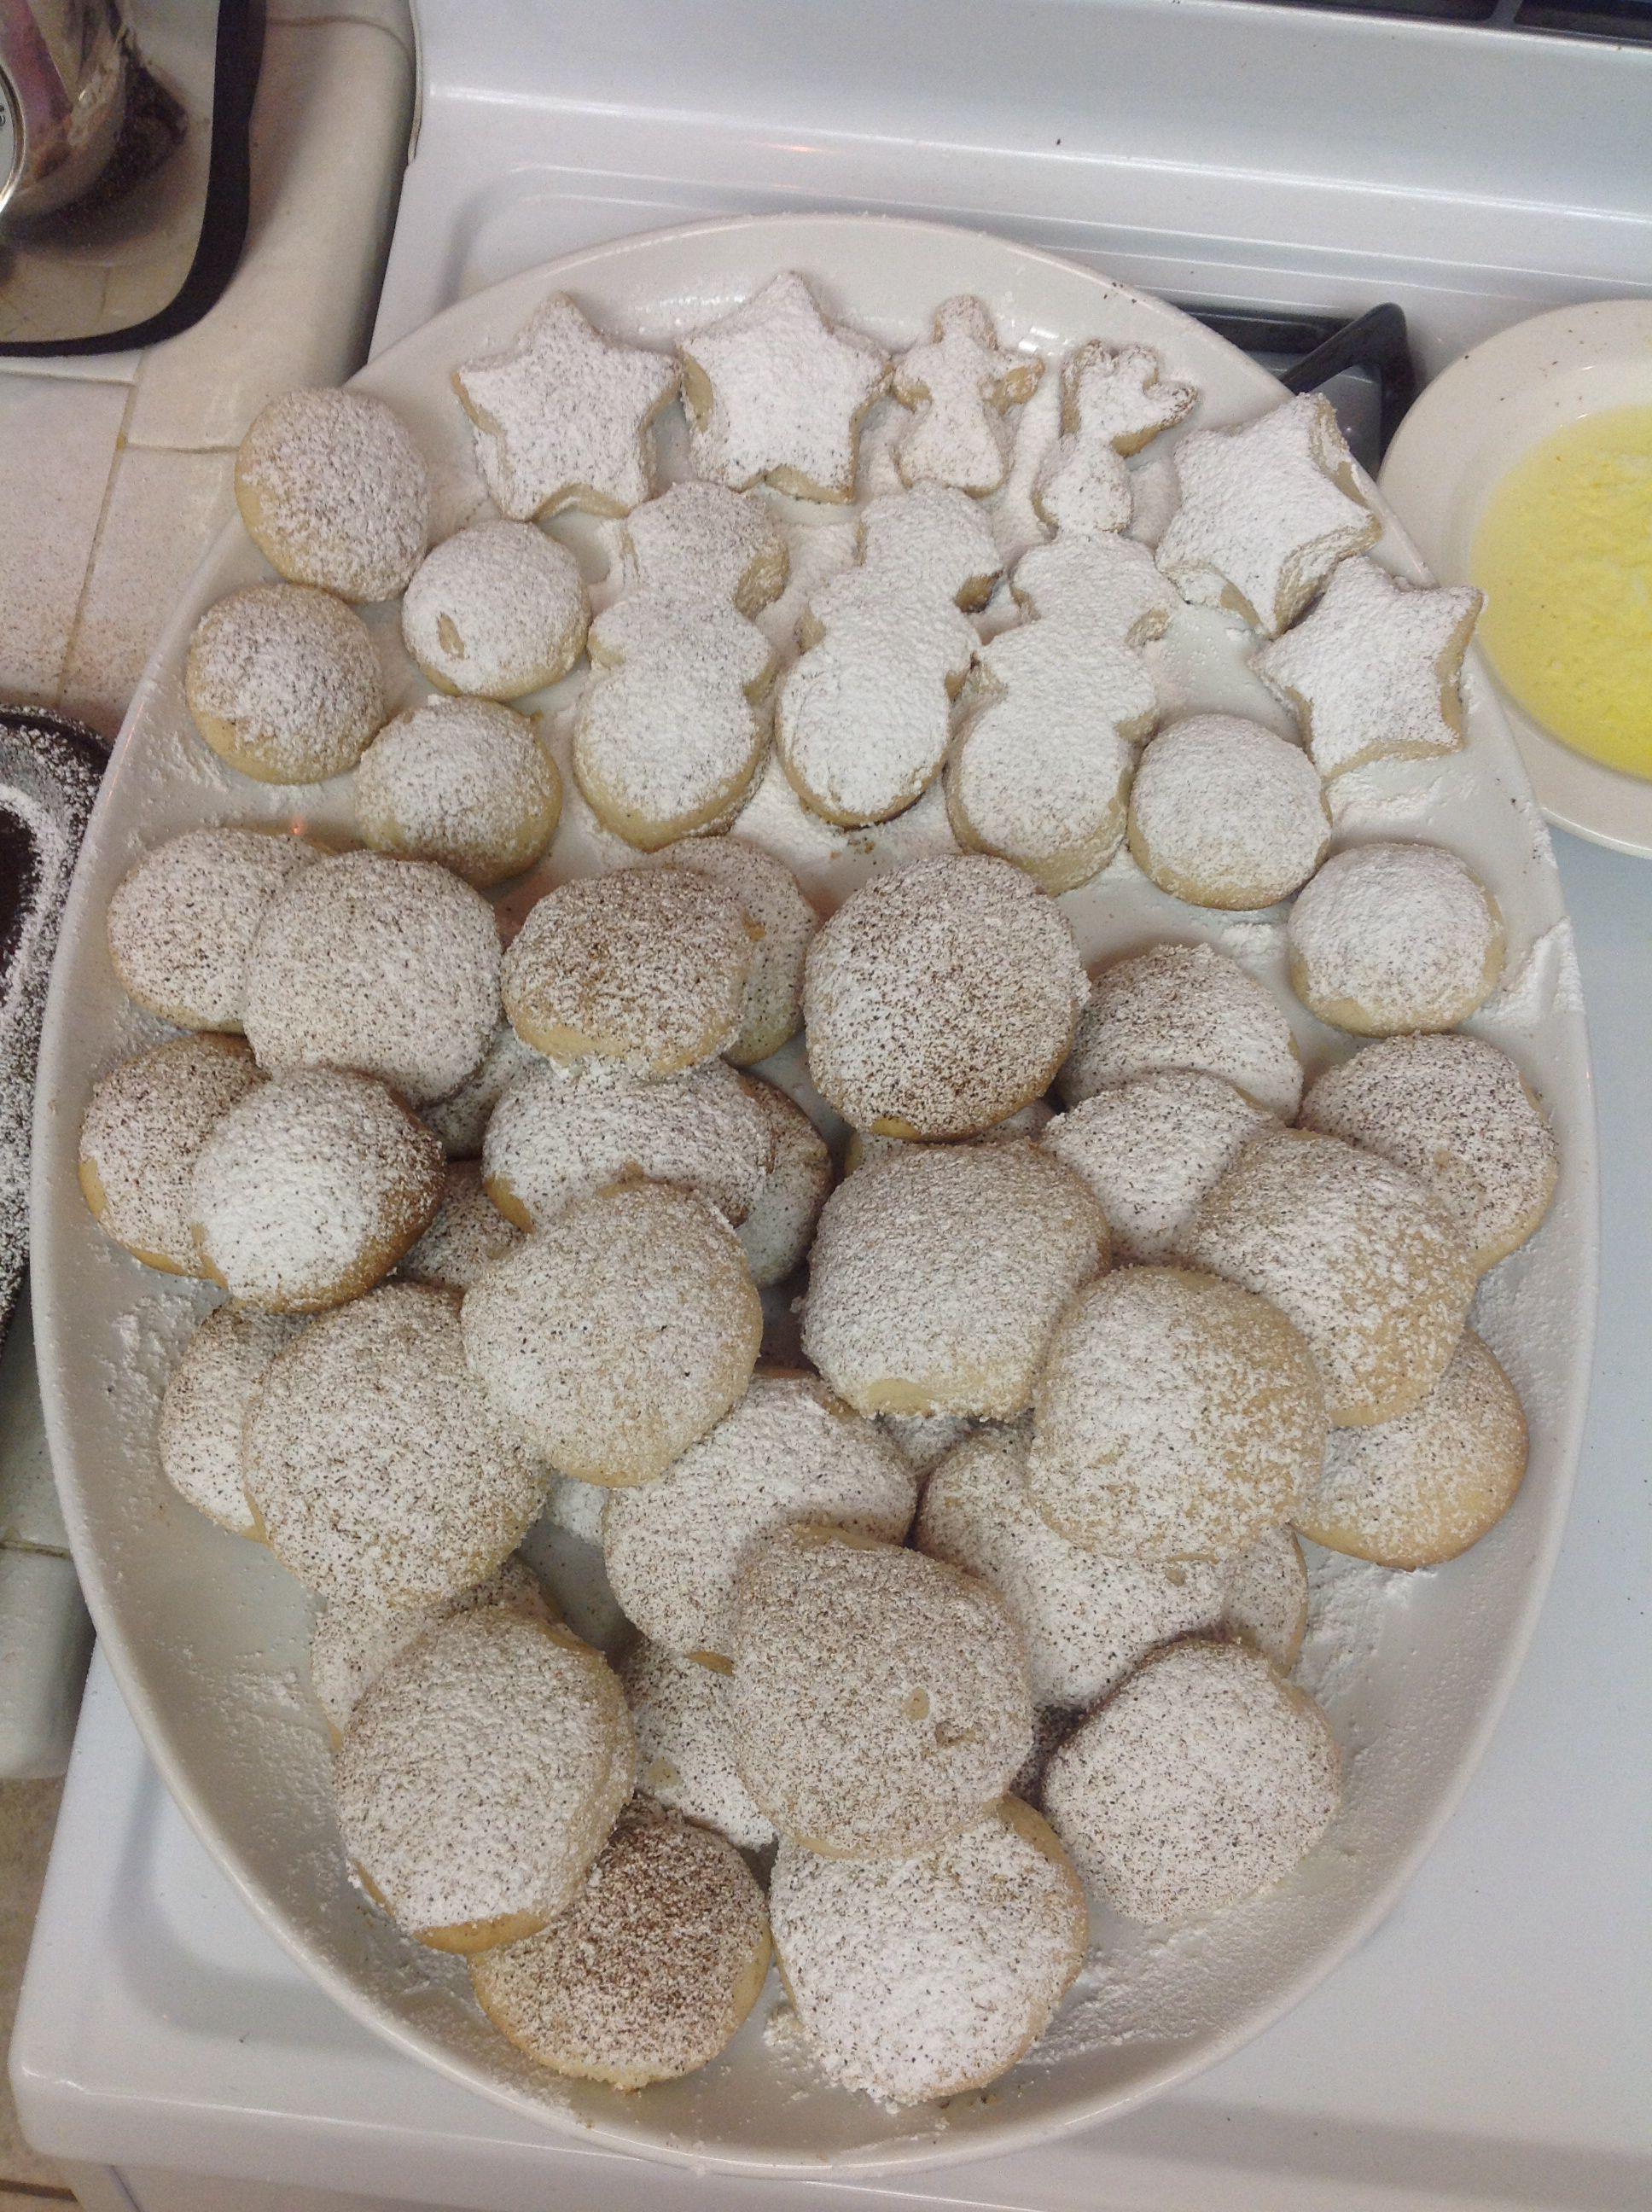 Bizcochos, polvorones, mexican wedding cookies, anise